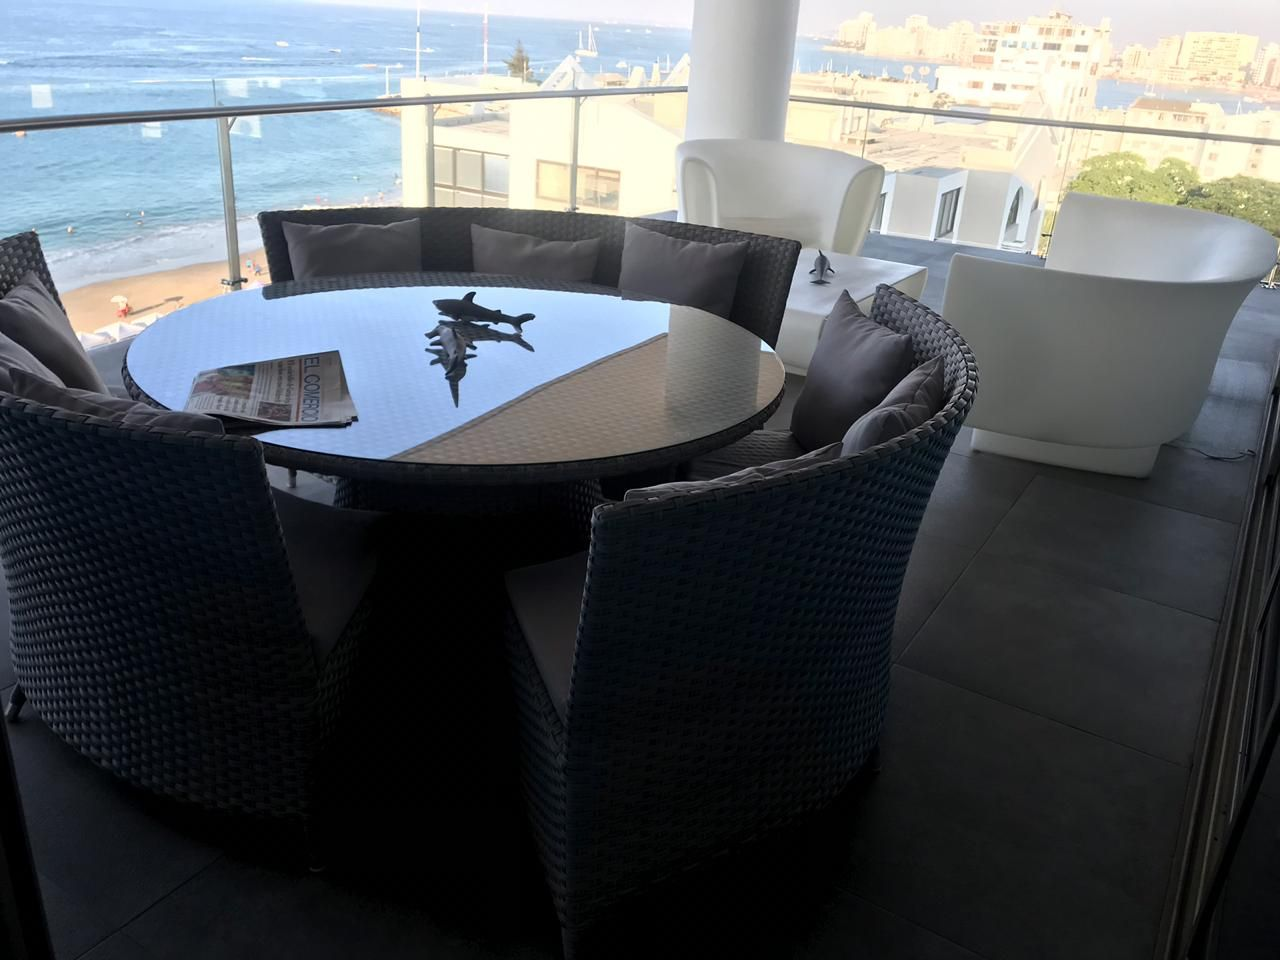 43Plentiful-And-Comfortable-Seating-On-Terrace-Balcony